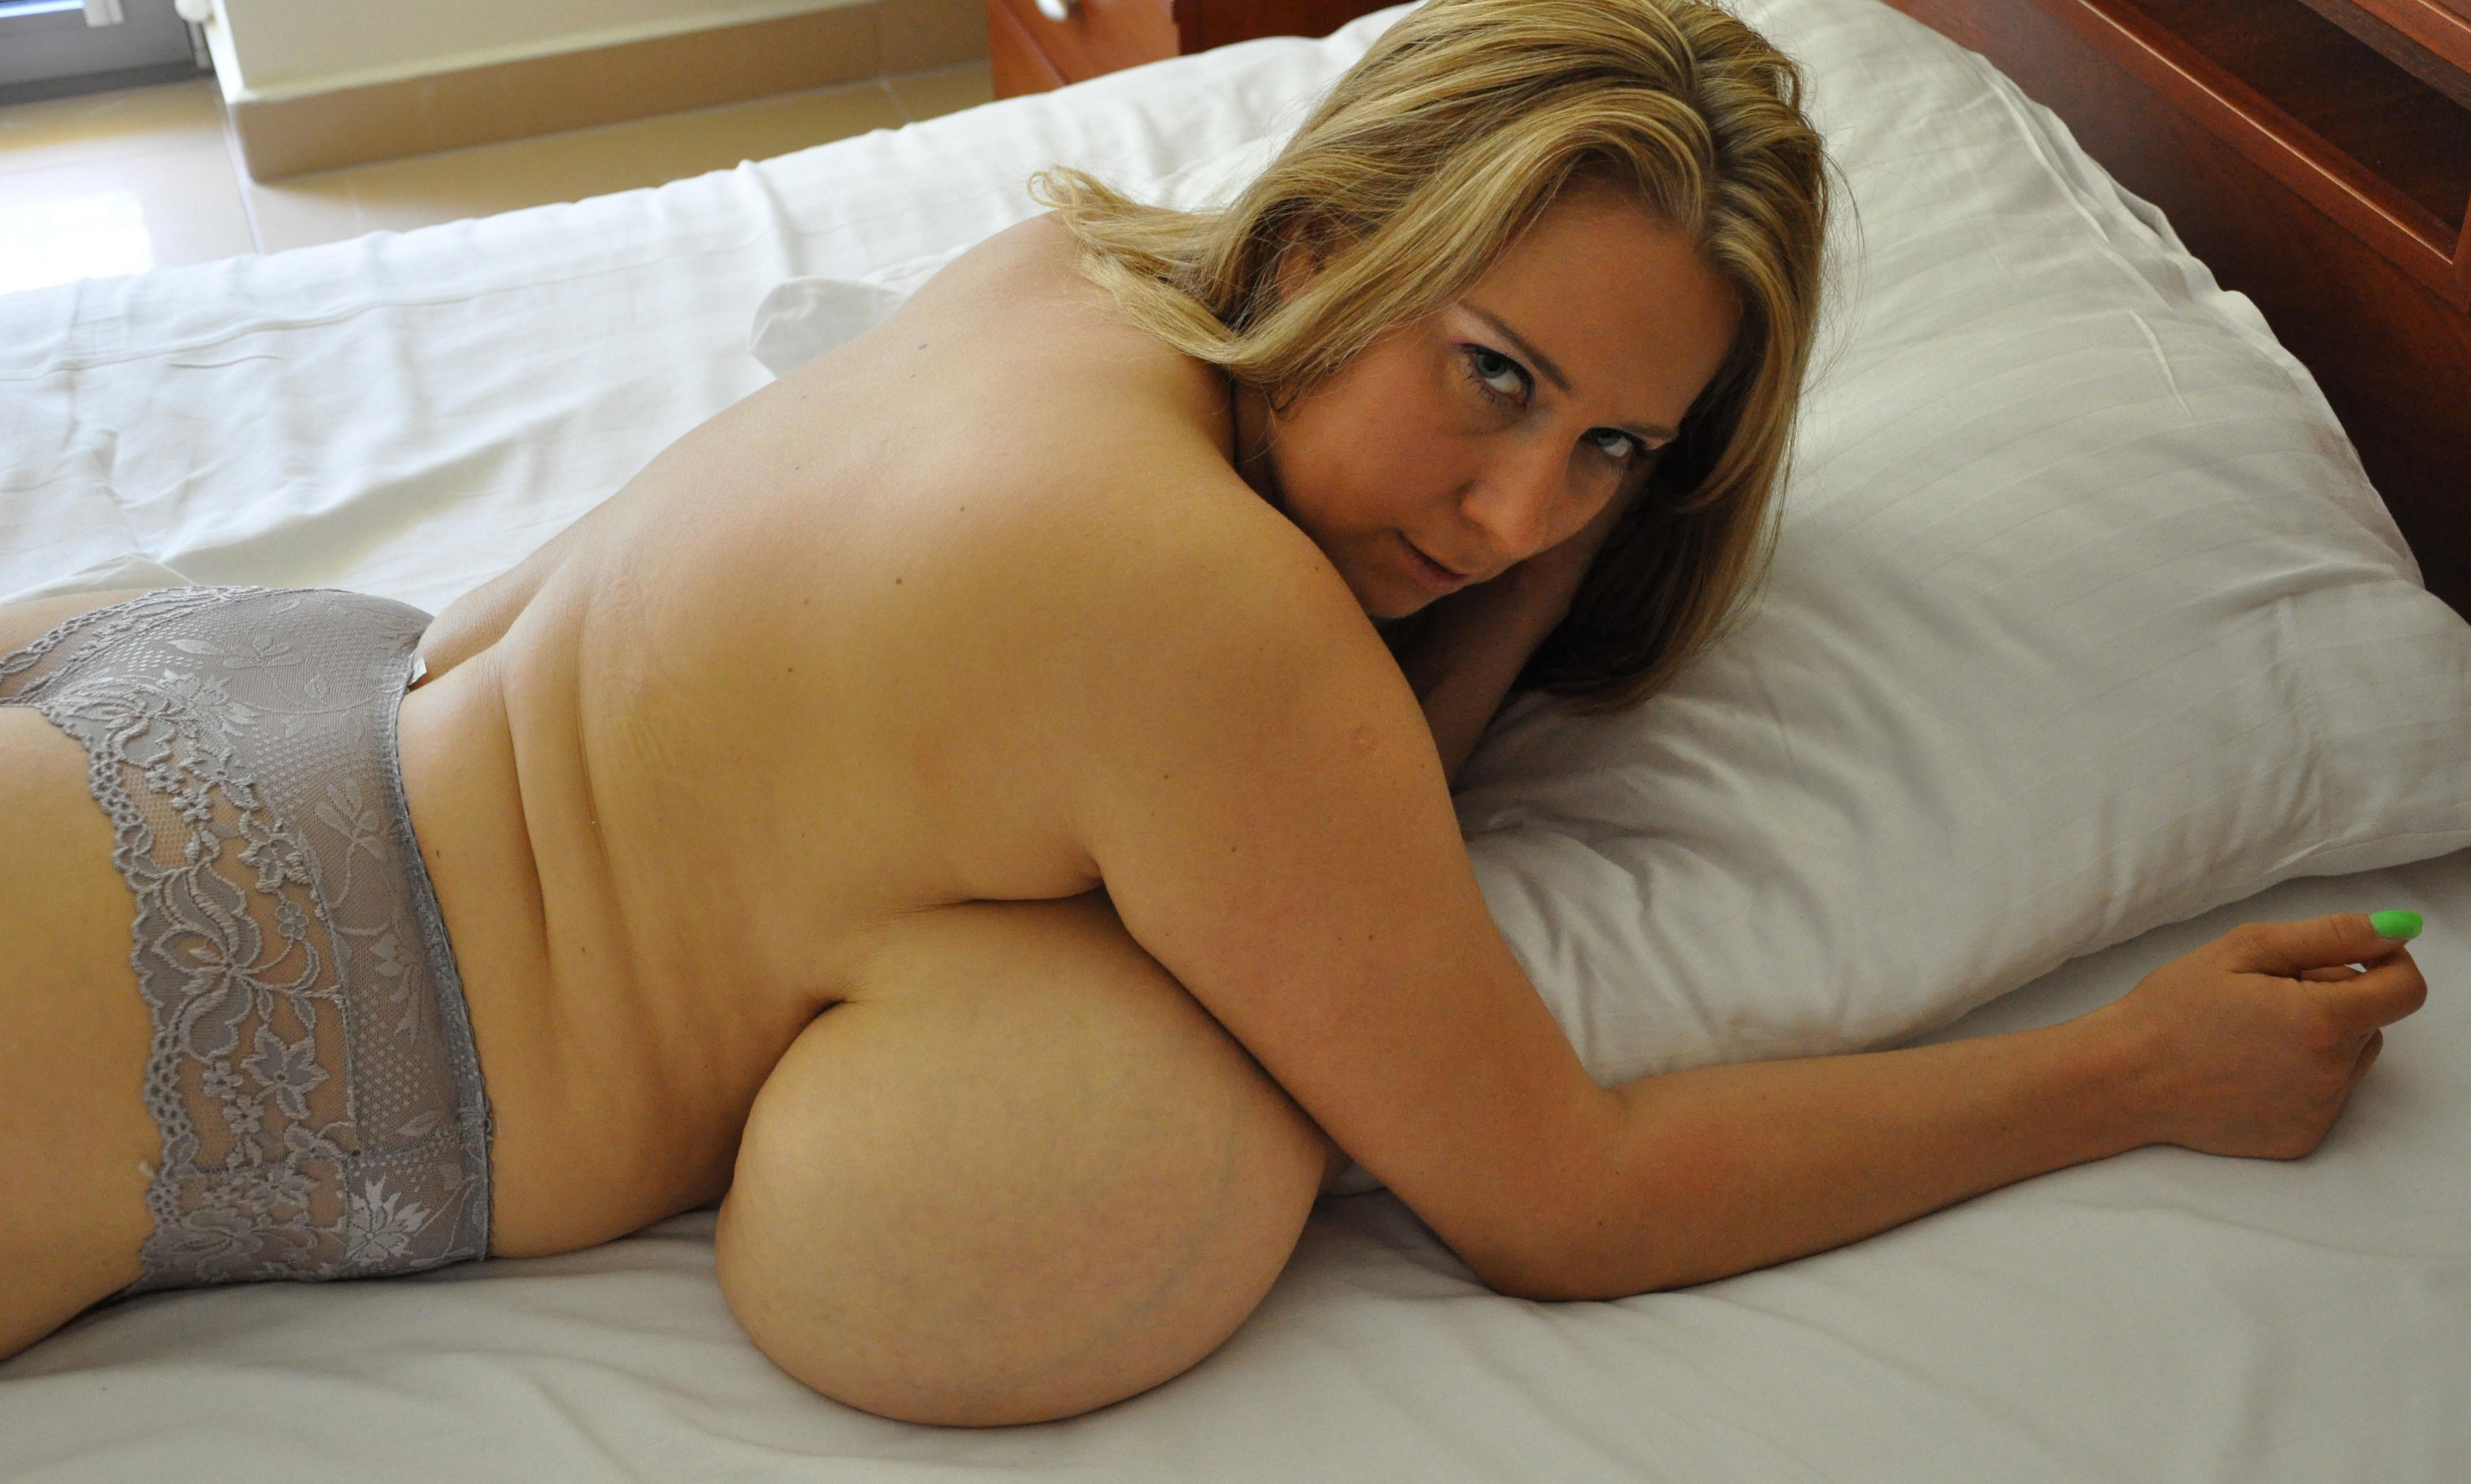 Нереально грудастая Эбби в кровати